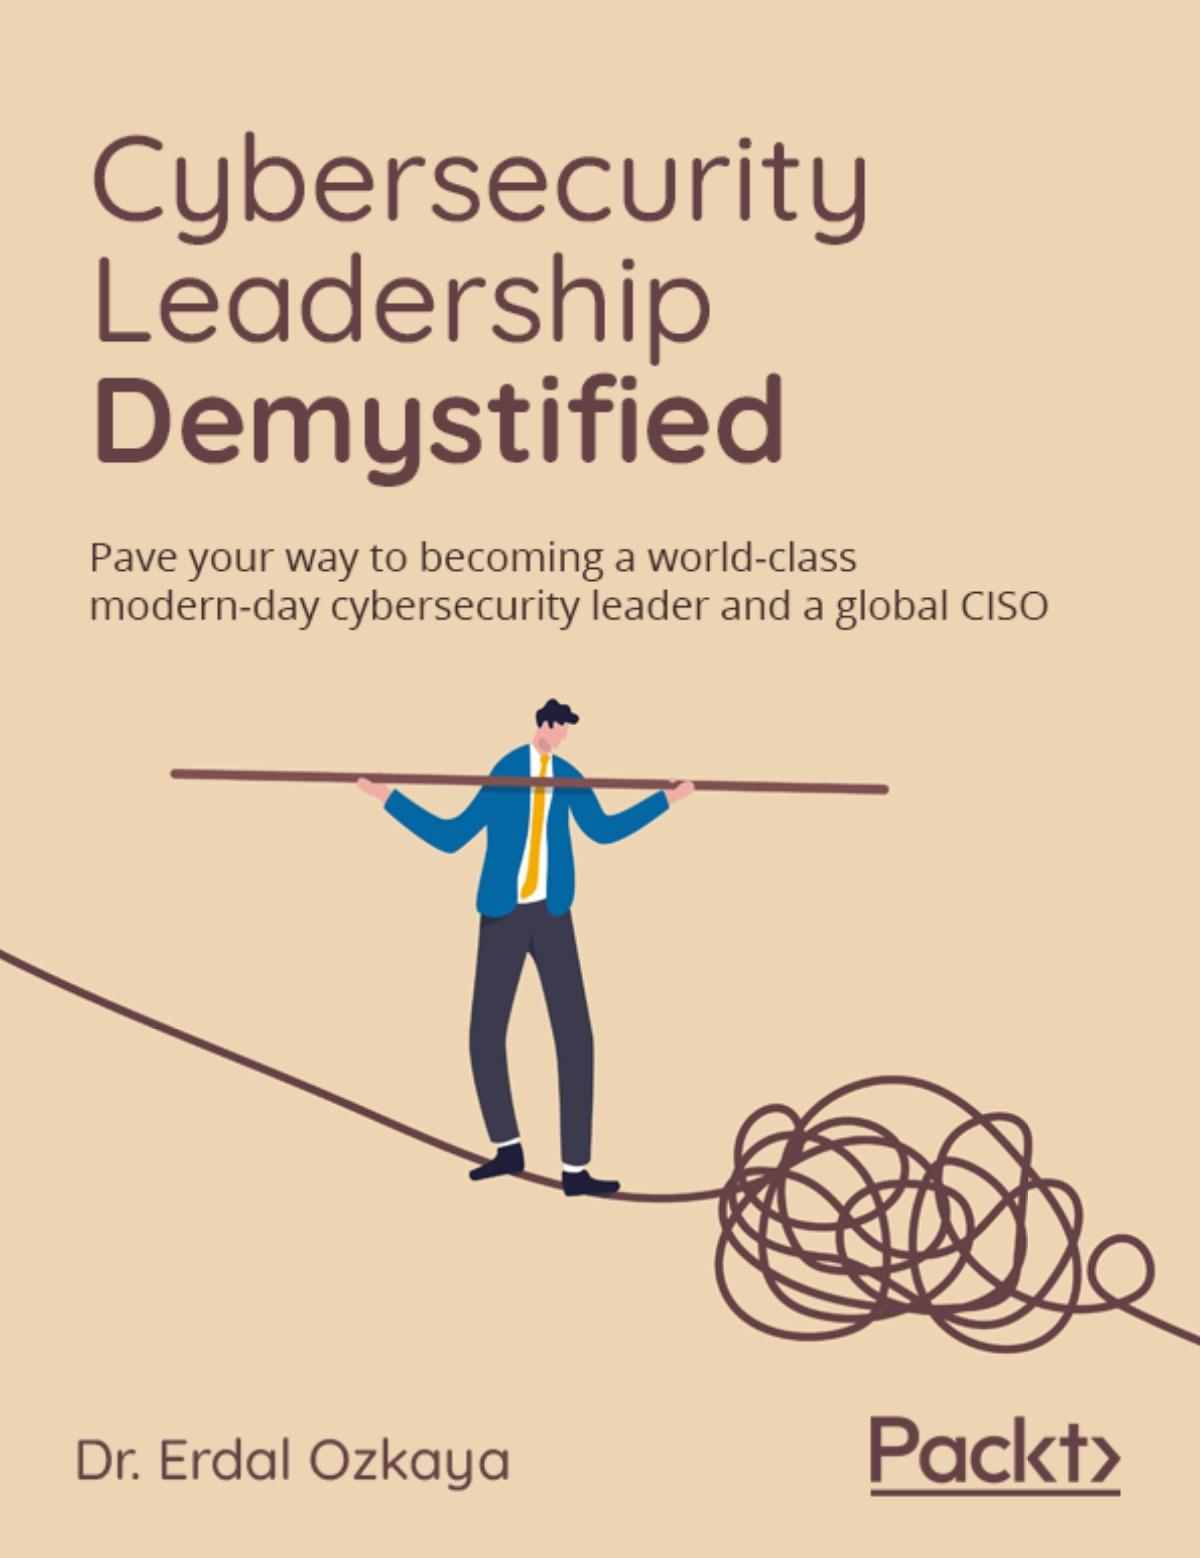 Cybersecurity Leadership Demystified by Dr Erdal Ozkaya